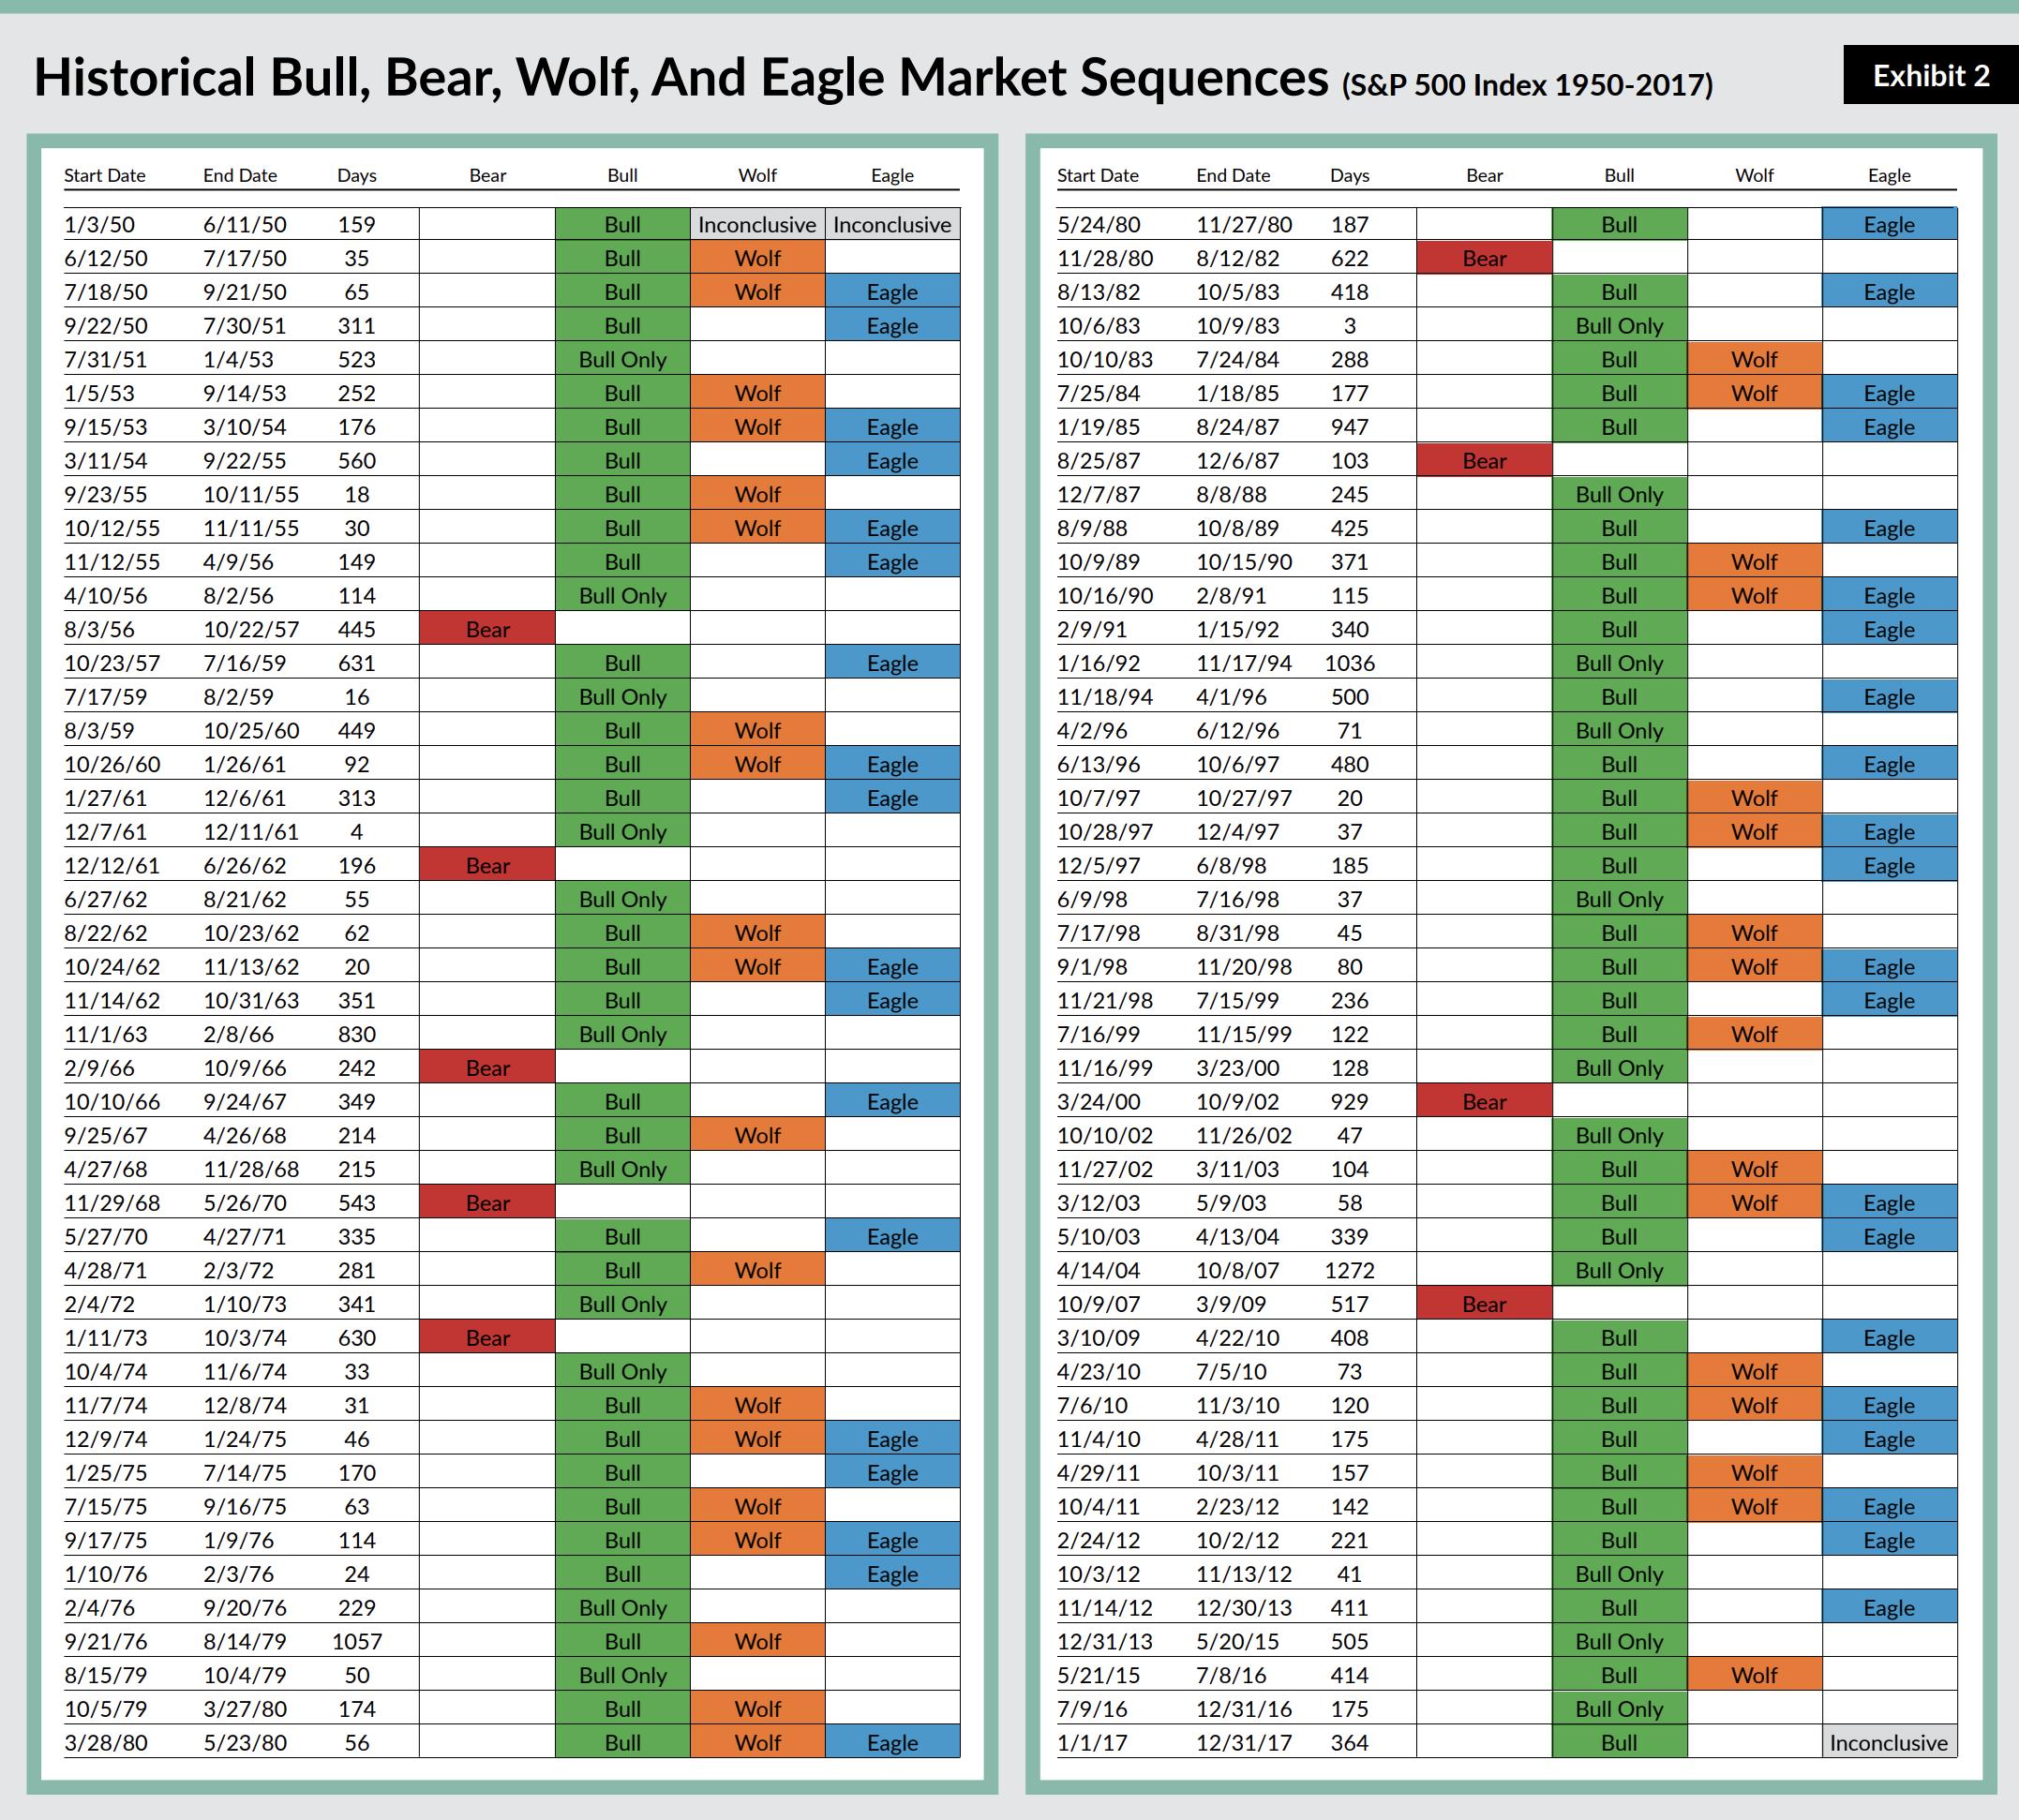 Market Sequences